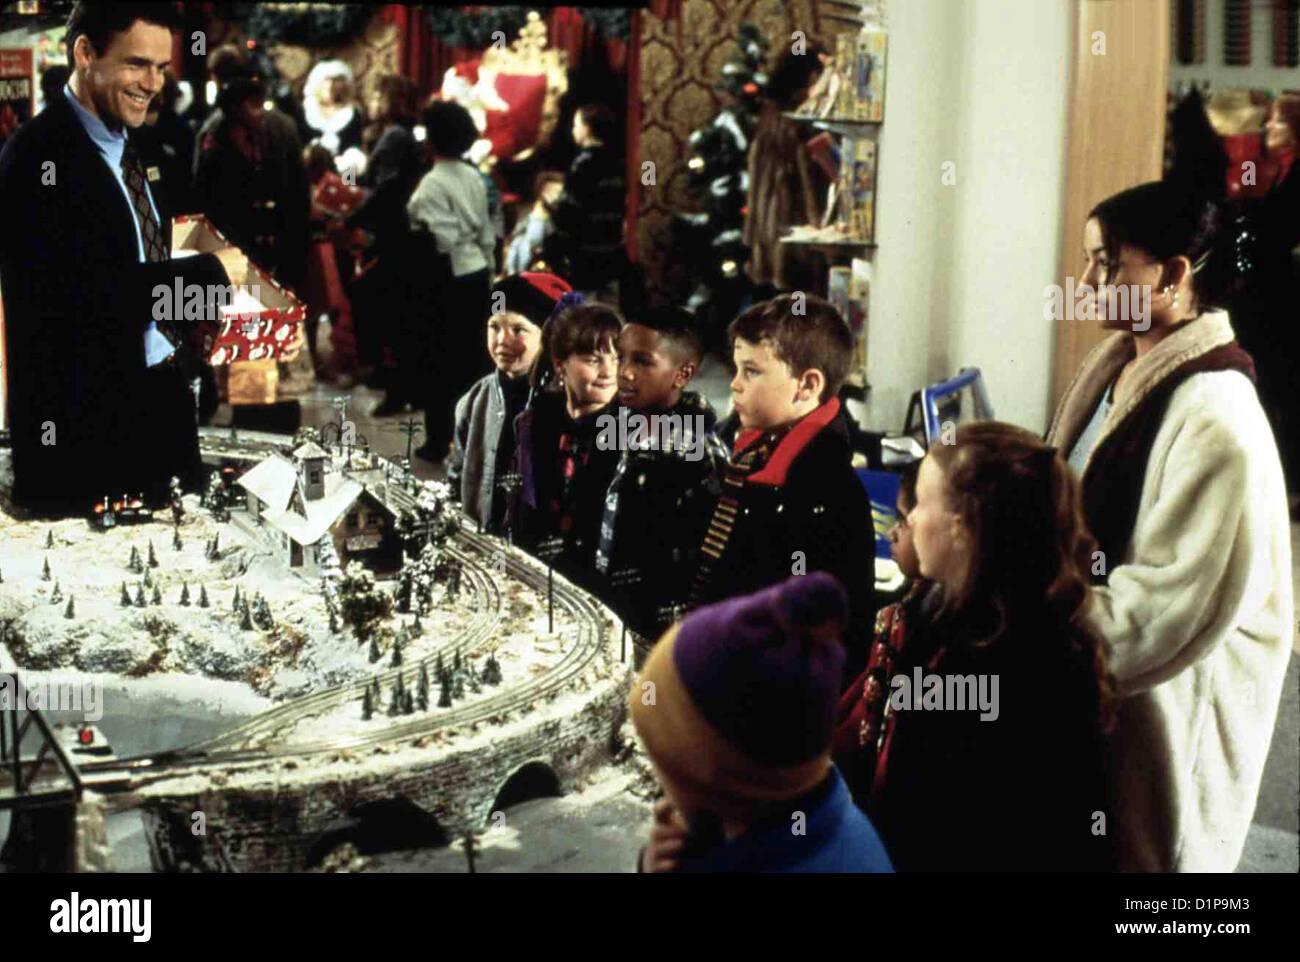 Leasing Weihnachtsbaum.L Affair Stock Photos L Affair Stock Images Alamy